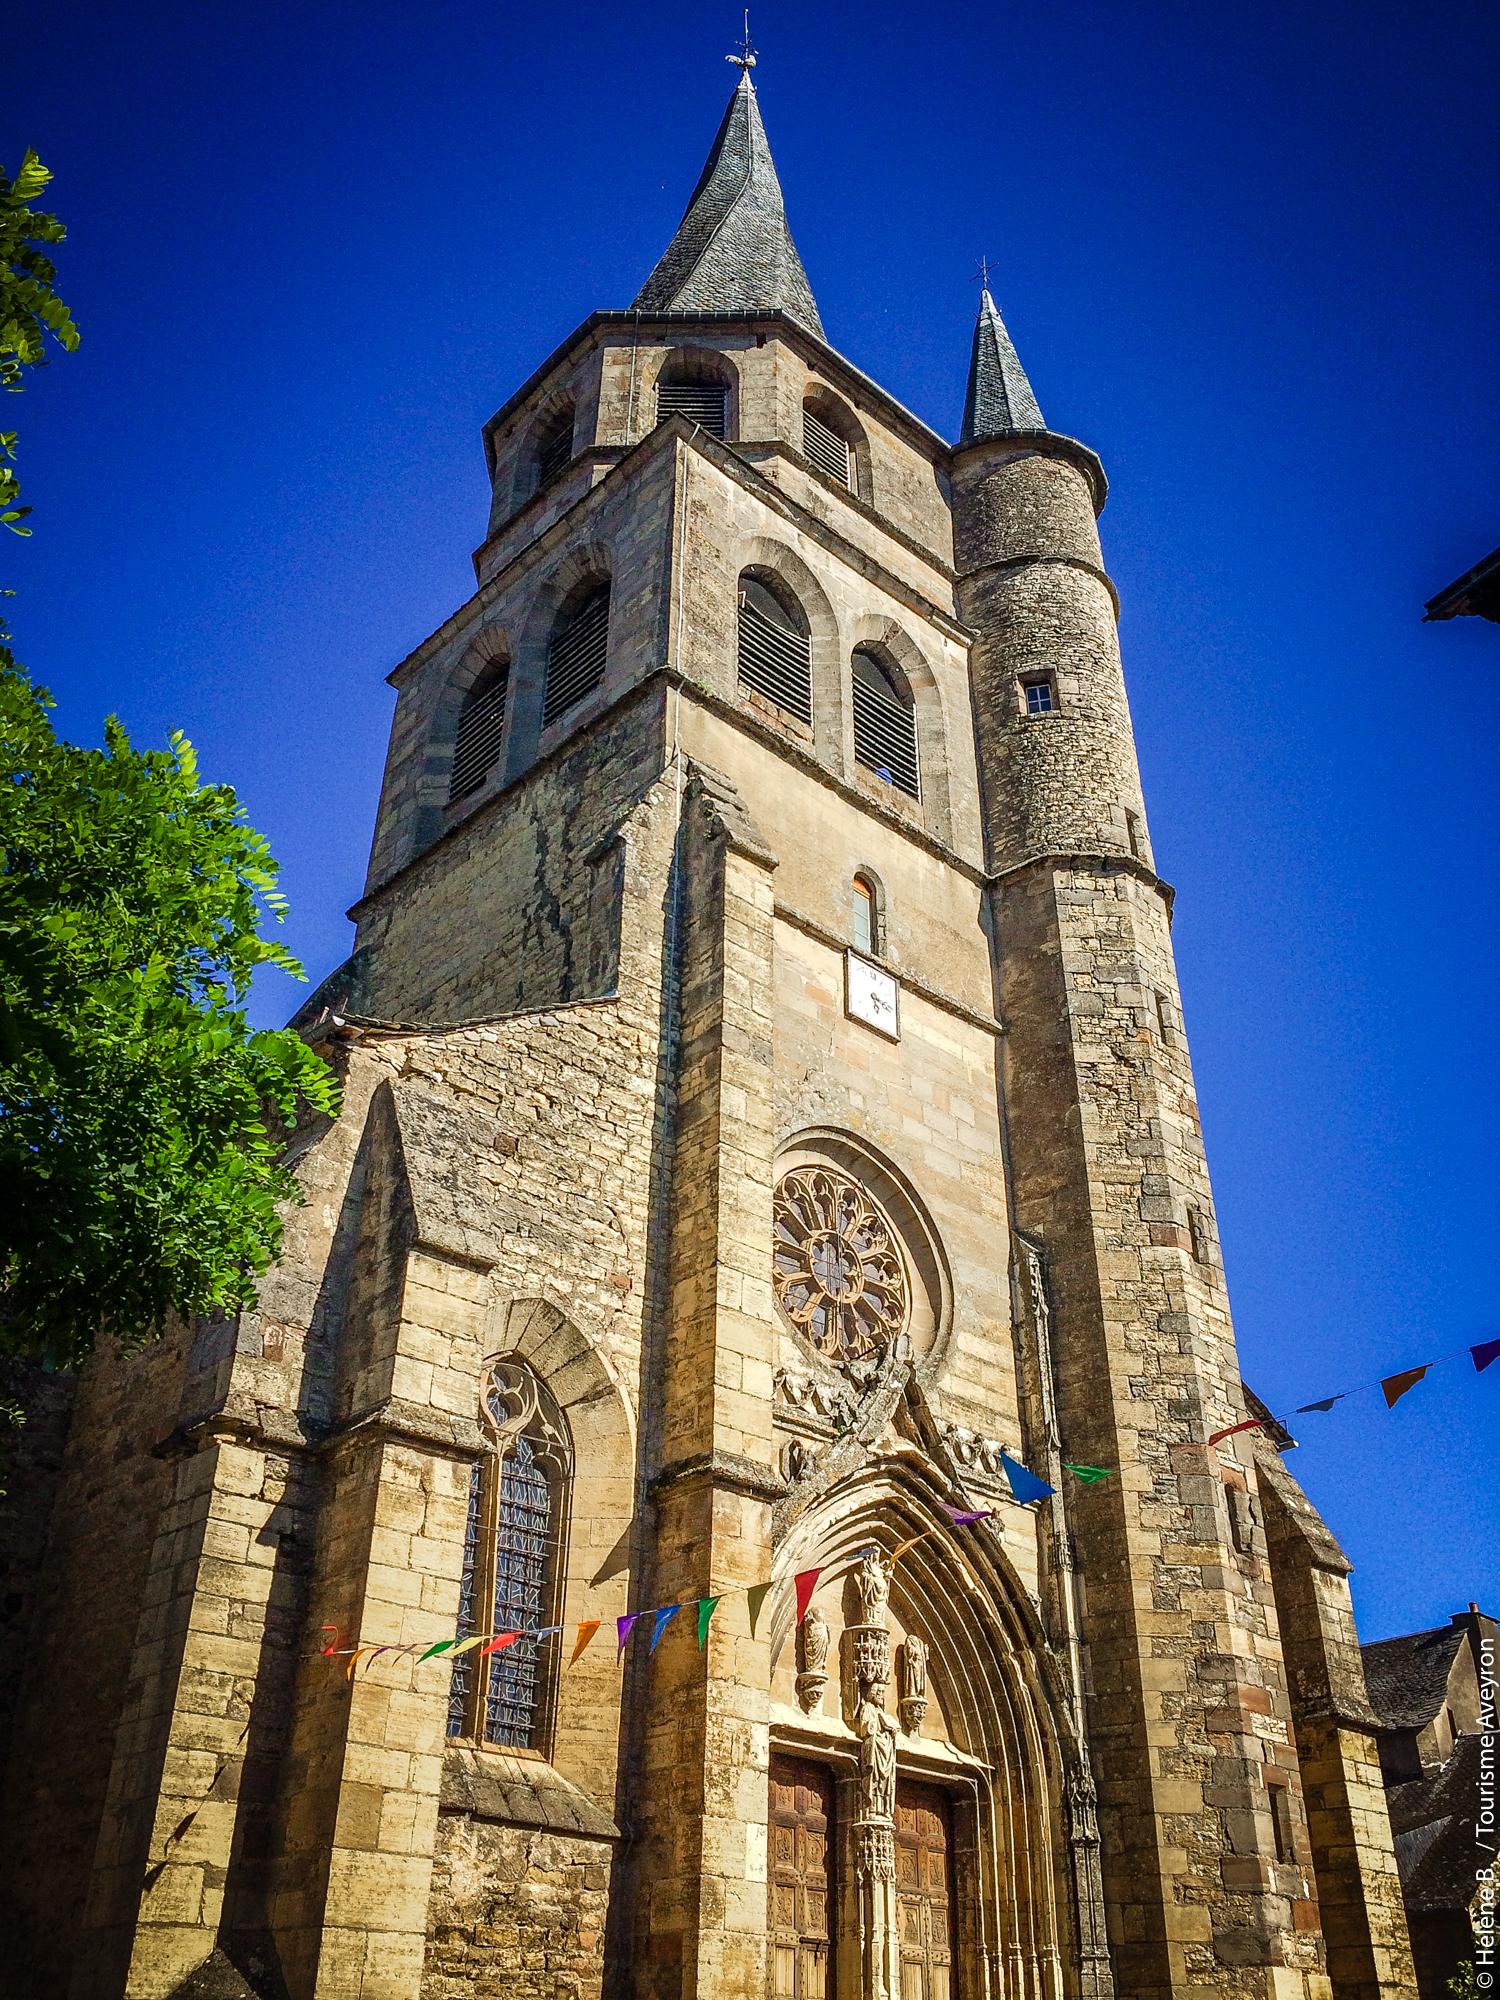 Eglise de Saint-Côme-d'Olt, Aveyron